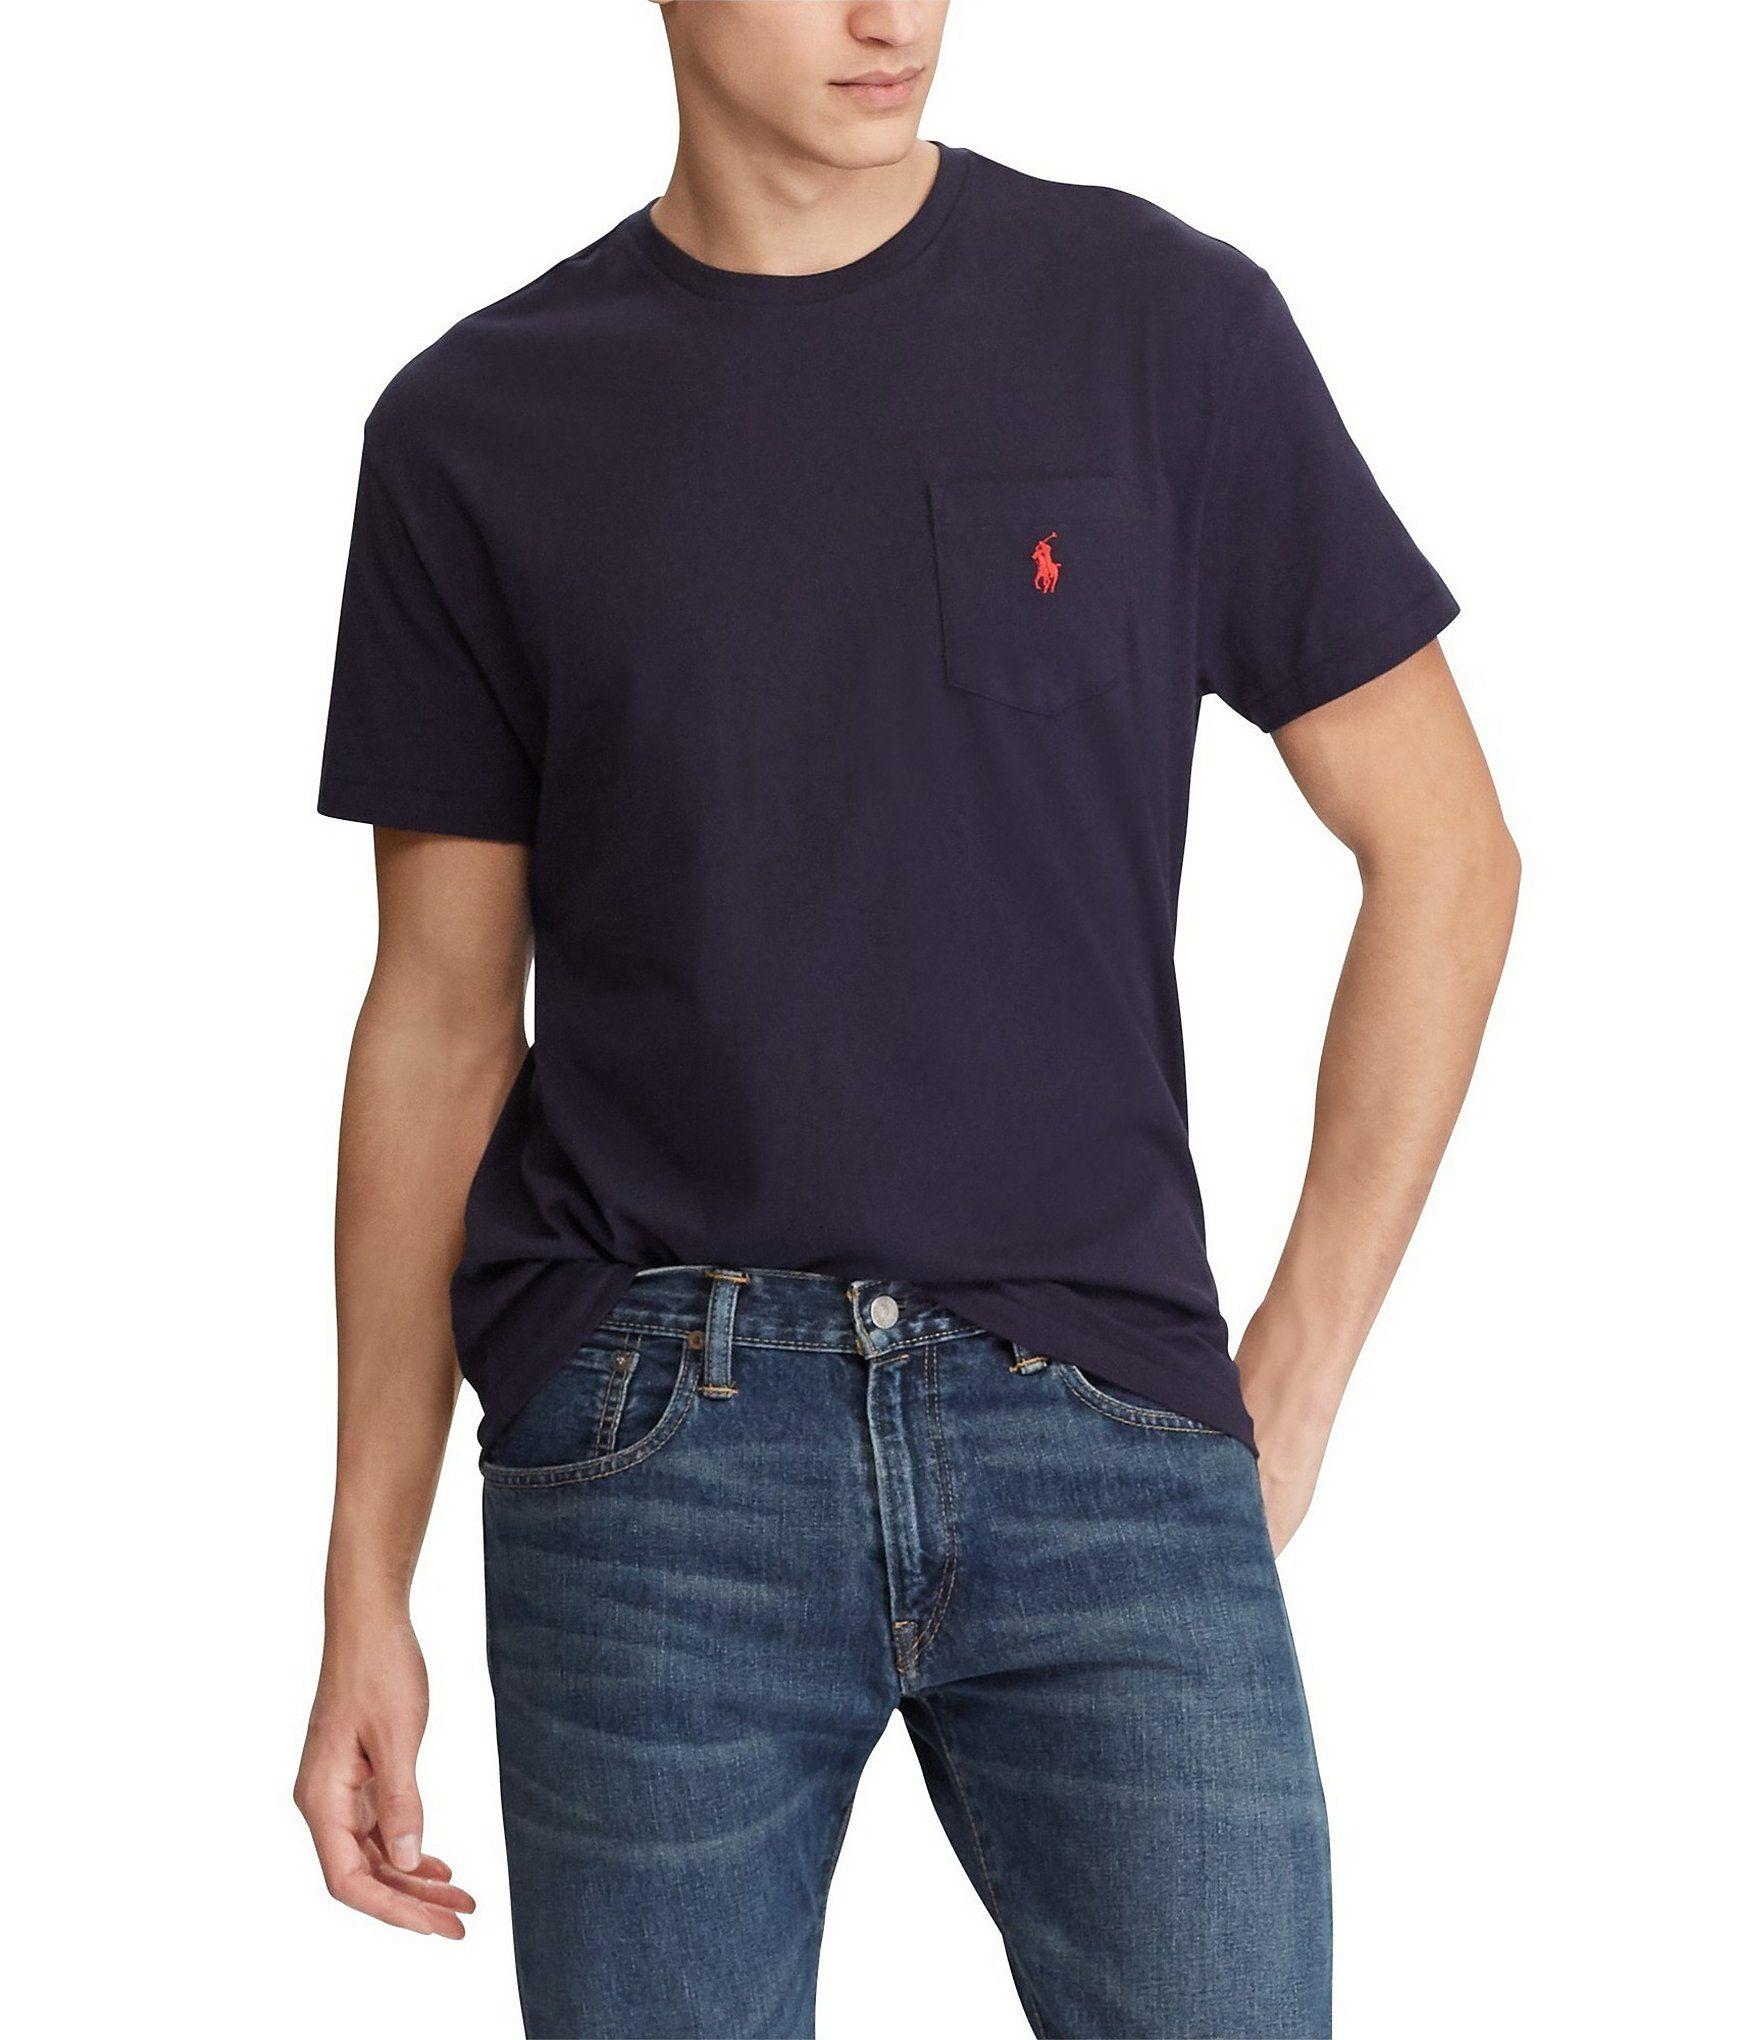 Polo Ralph Lauren Classic Fit Jersey Crewneck Short Sleeve Tee